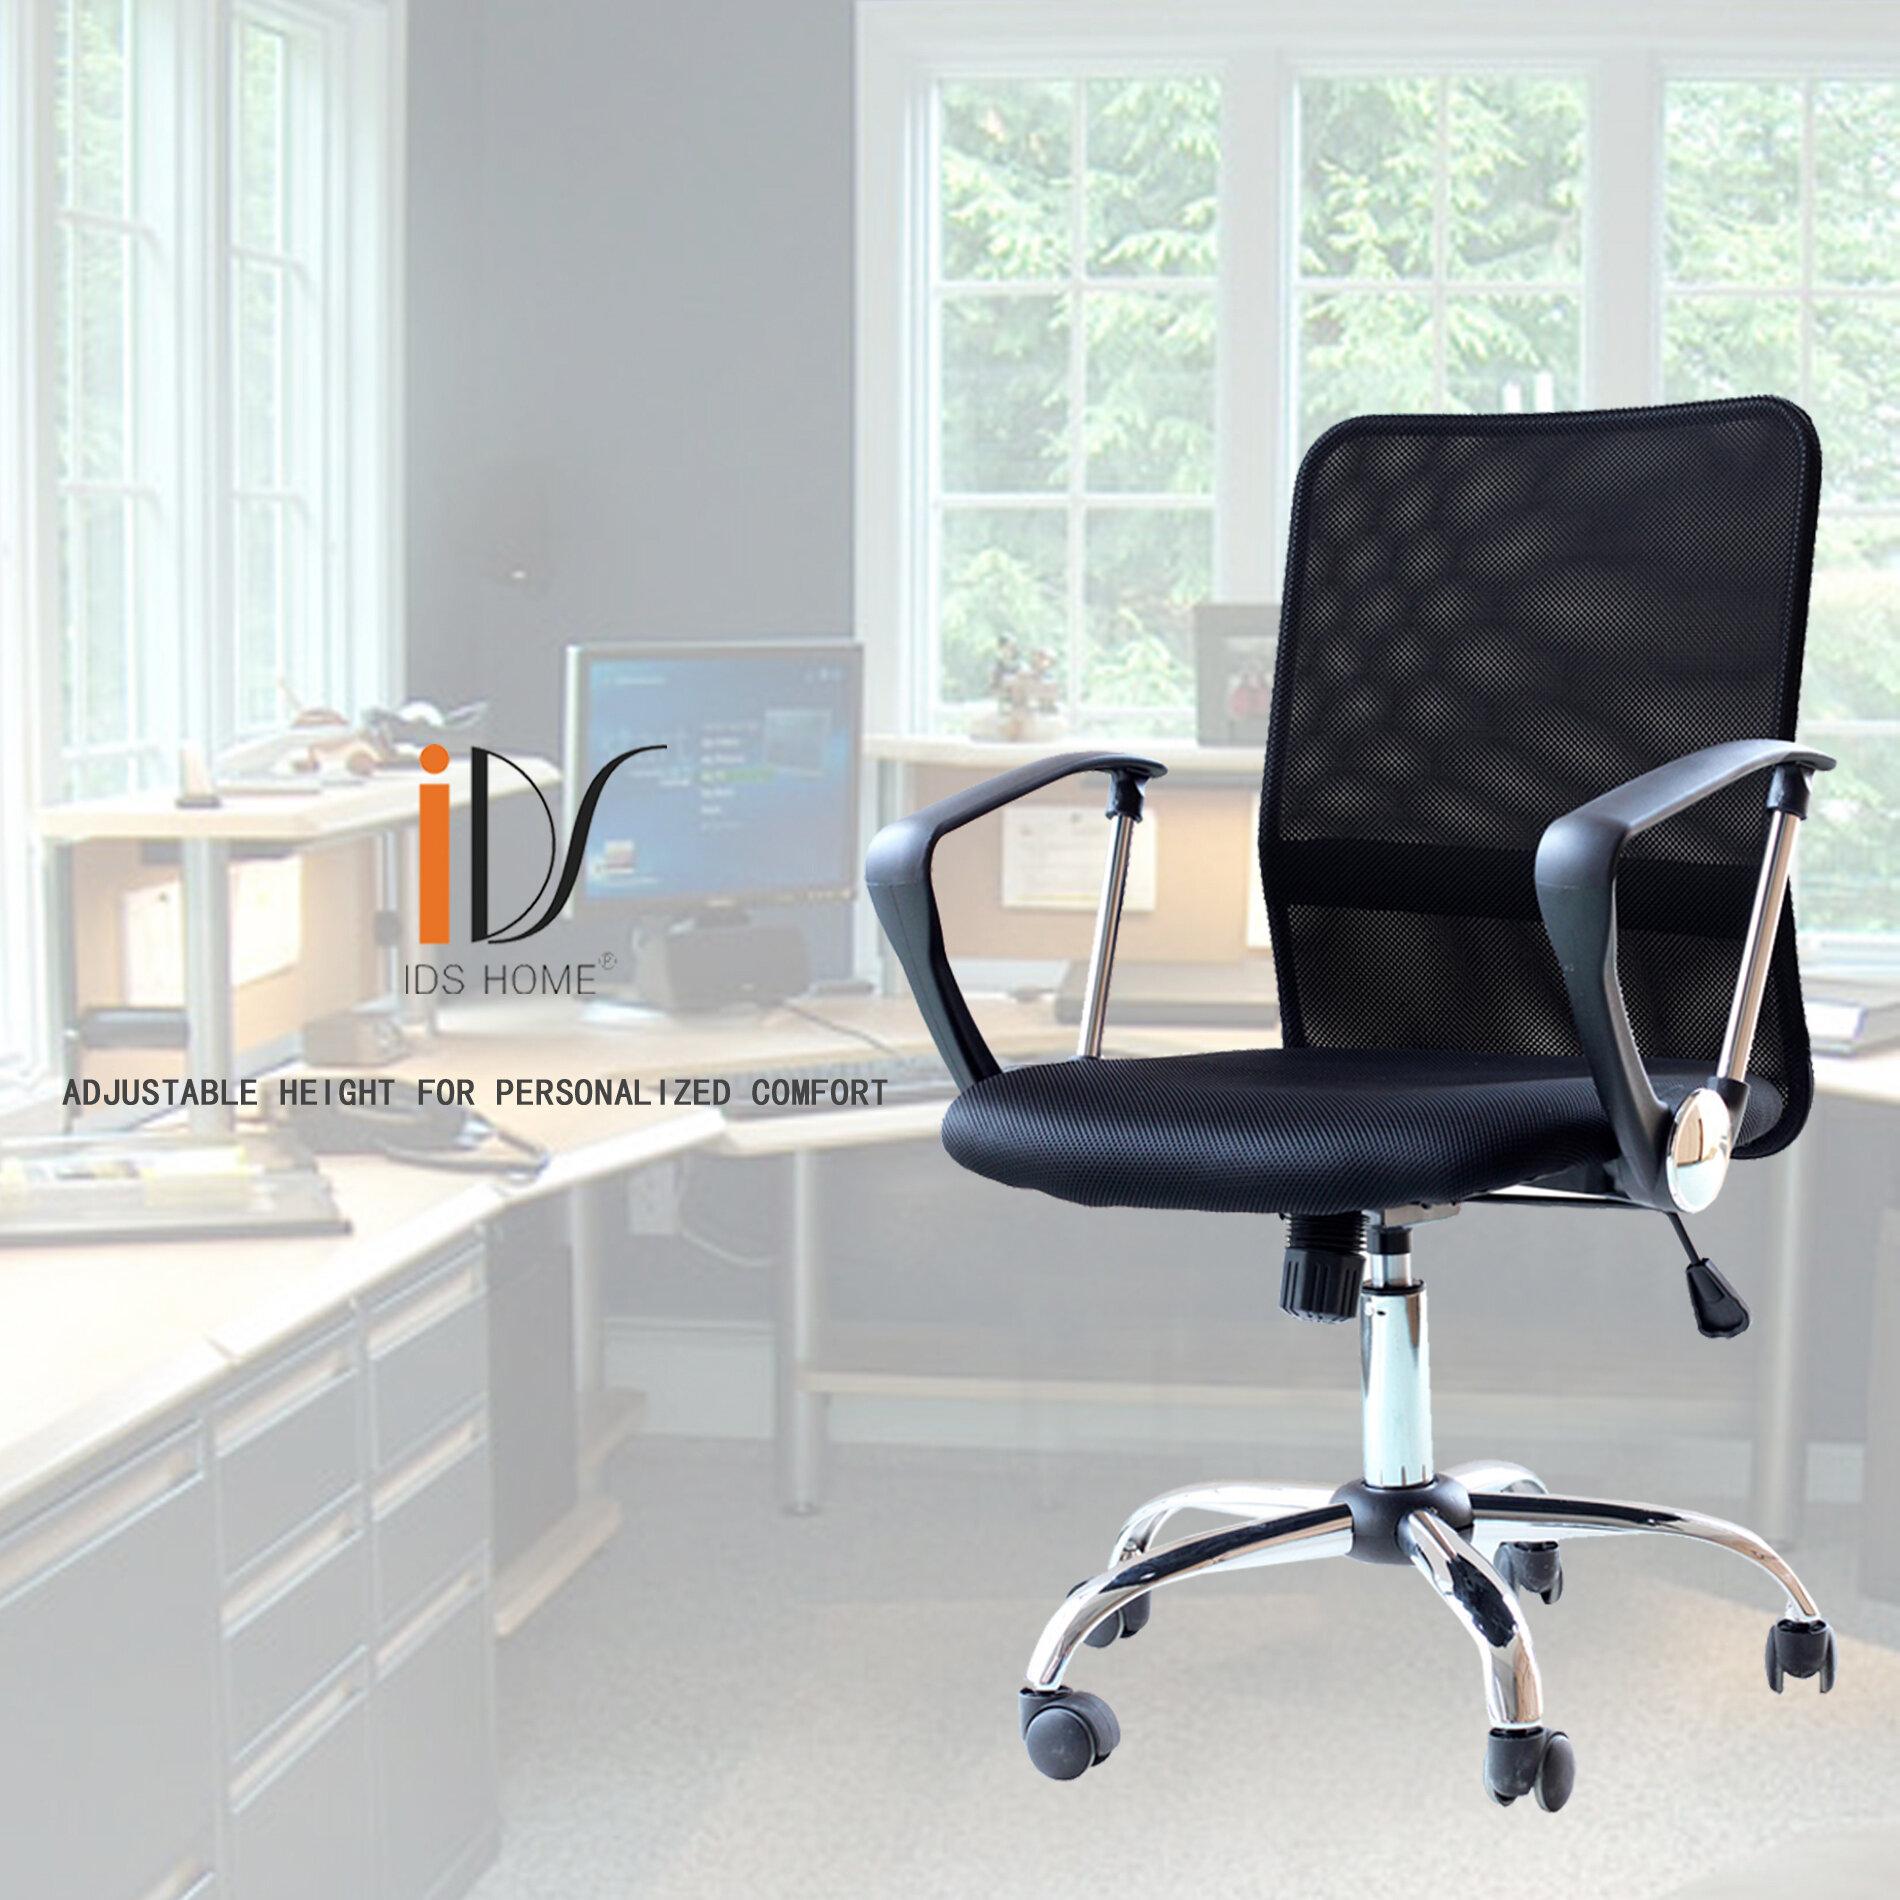 IDSOnlineCorp Ergonomic Mesh Mid Back Office Chair U0026 Reviews   Wayfair